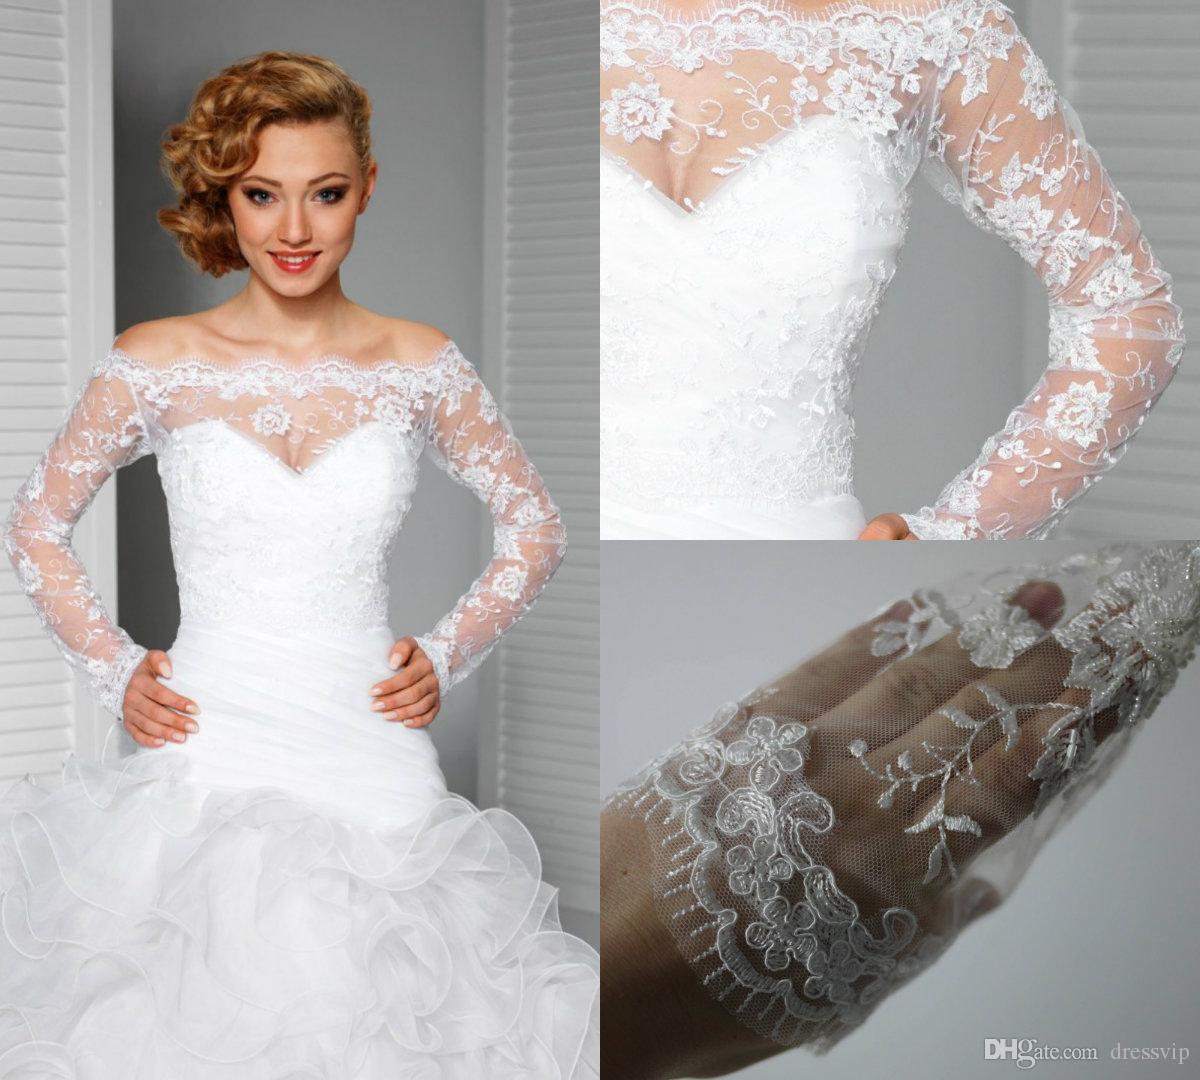 0adef9d75b7 2019 2018 Elegant Off Shoulder Lace Bolero Jacket Illusion Covered Button Jackets  Bridal Shrug Bride Wraps Wedding Dress Accessories Shawl From Dressvip